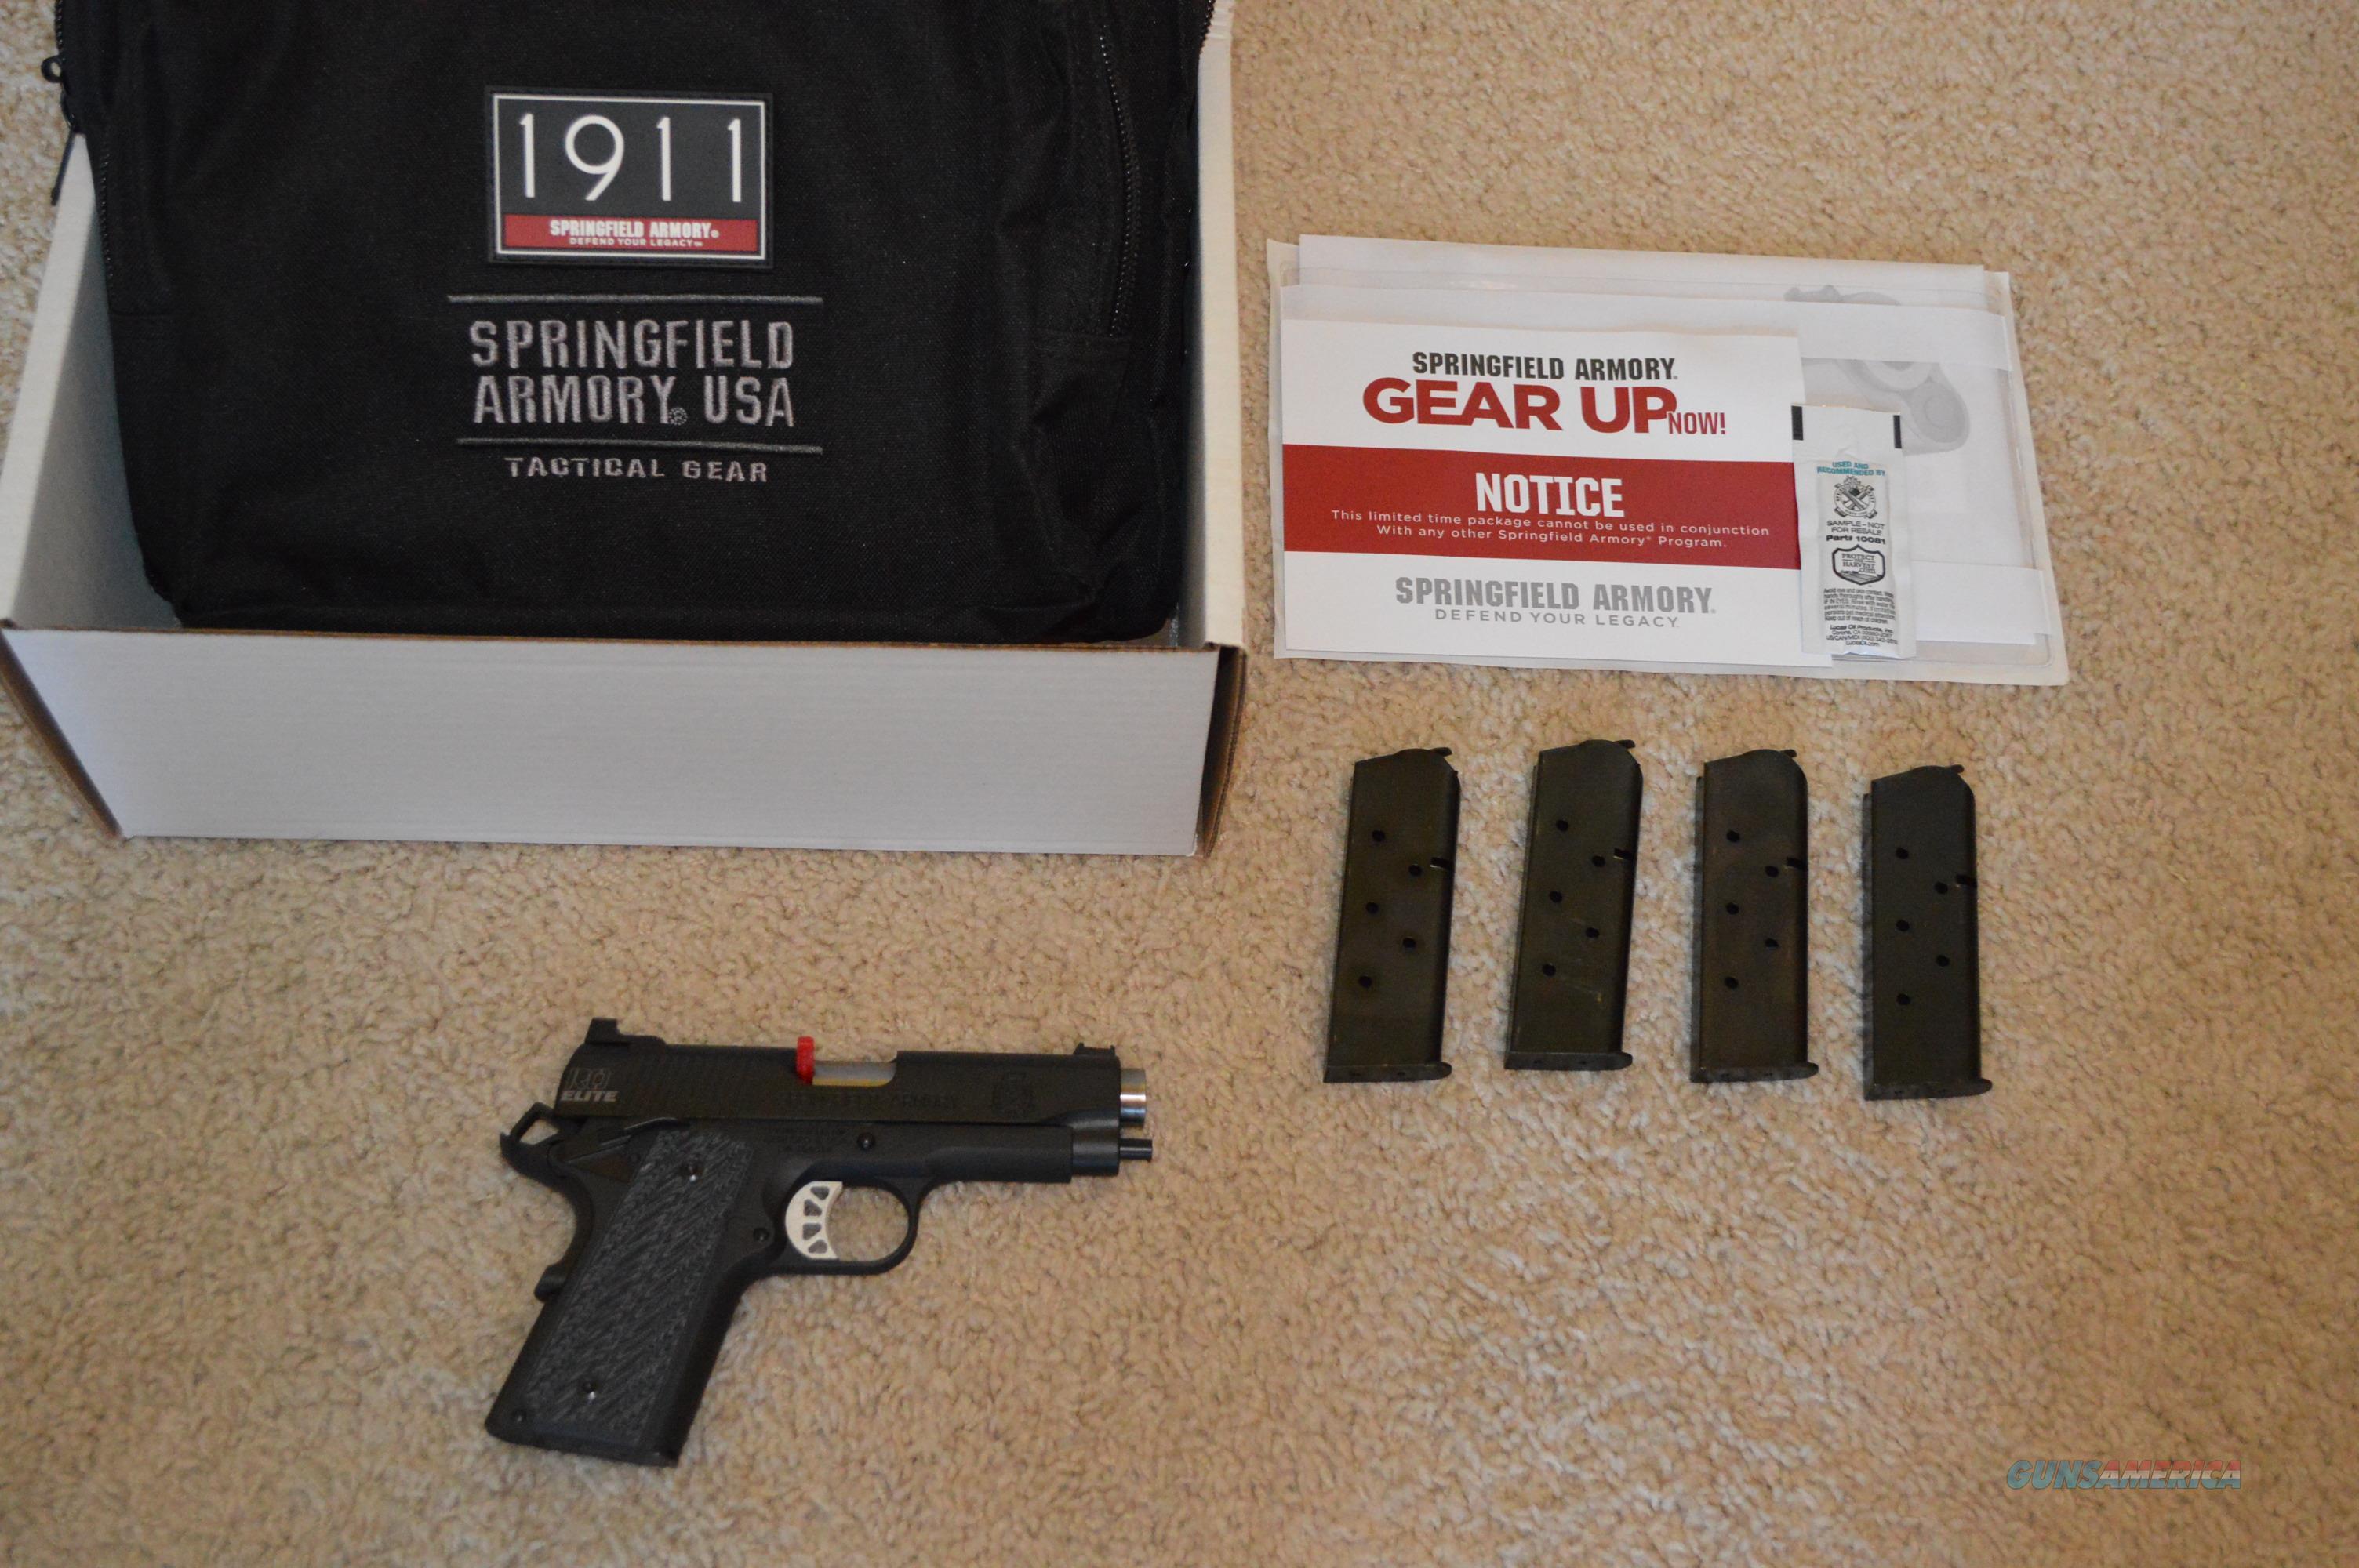 ON SALE! Springfield Range Officer Elite Compact Gear Up  Guns > Pistols > Springfield Armory Pistols > 1911 Type